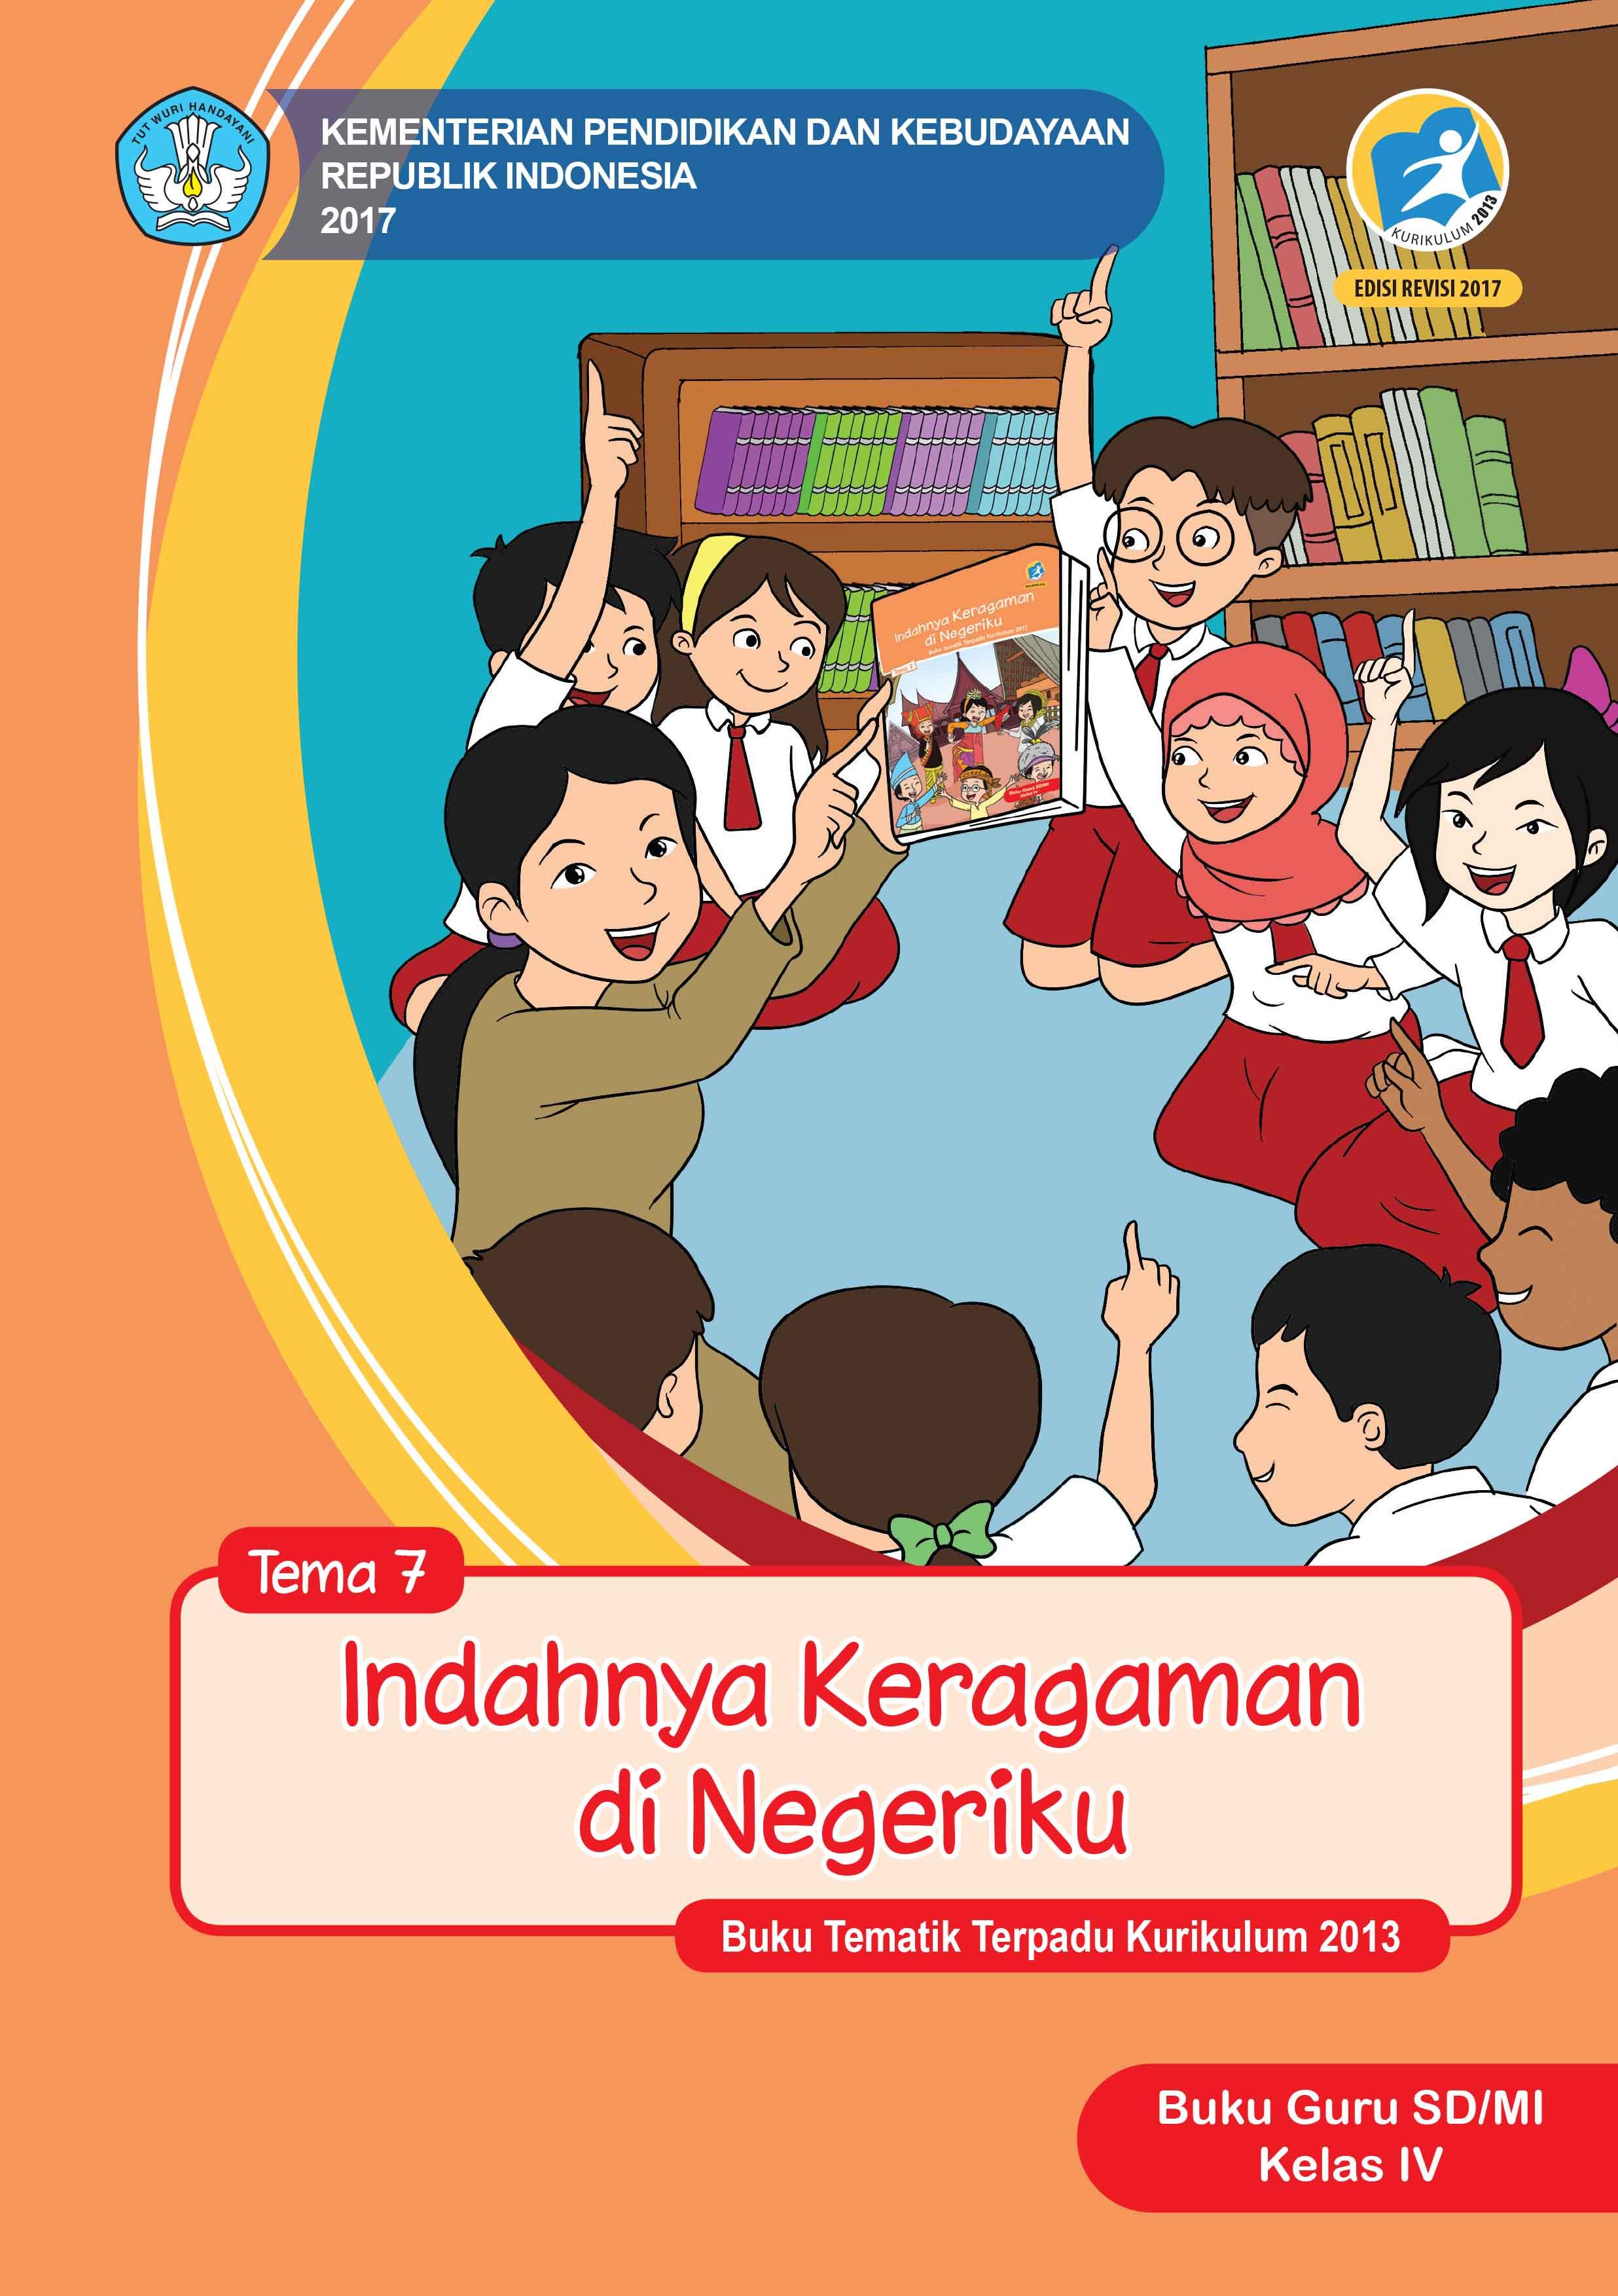 Buku Guru Tema 7: Indahnya Keragaman di Negeriku